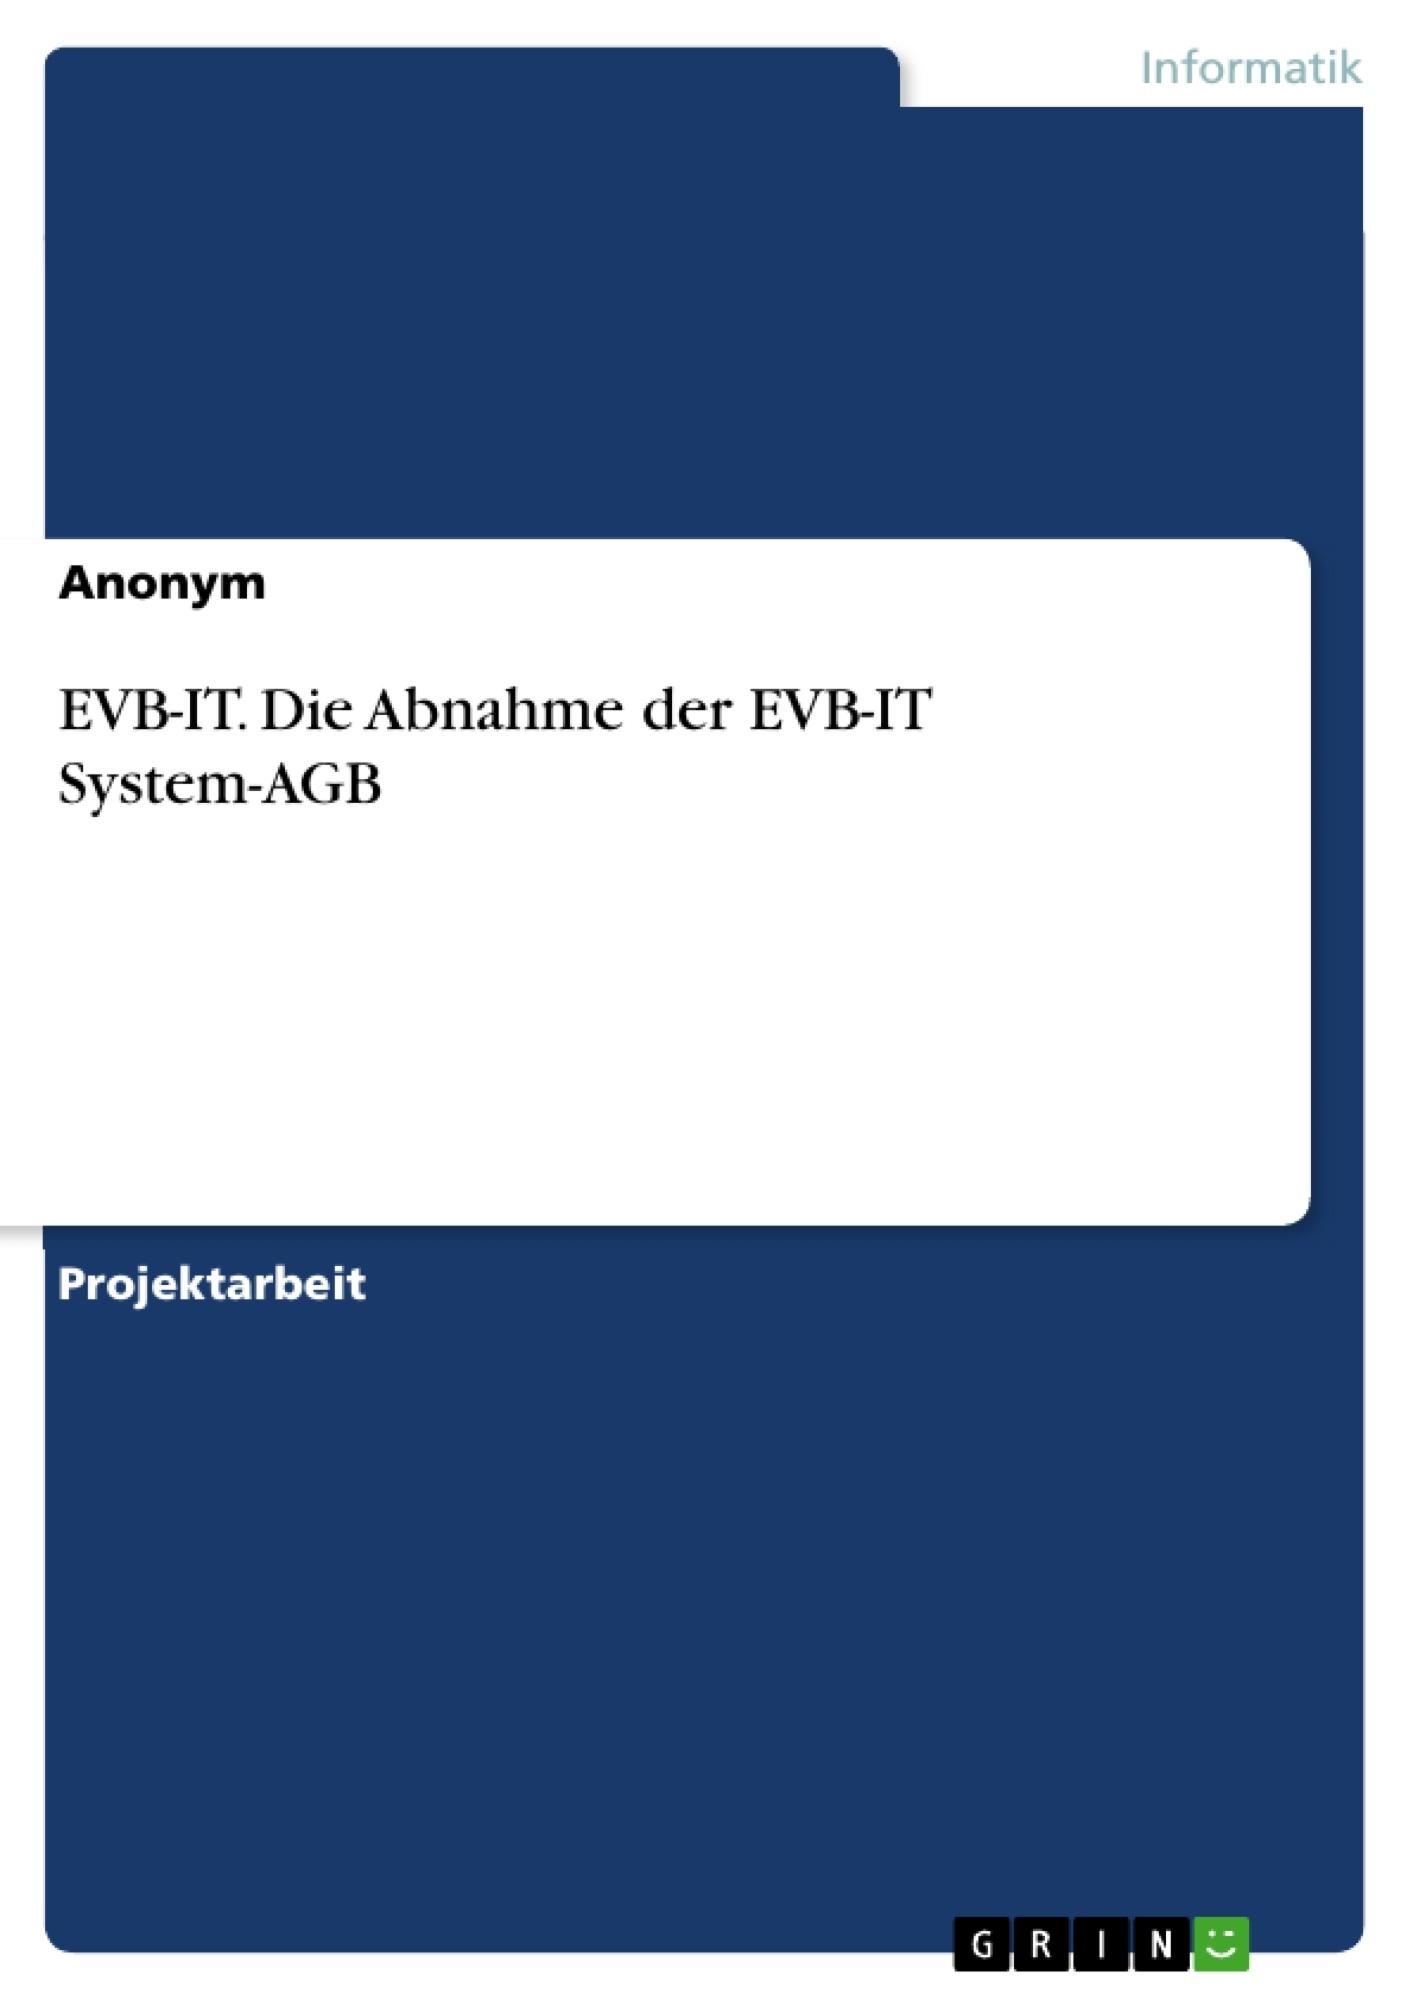 Titel: EVB-IT. Die Abnahme der EVB-IT System-AGB